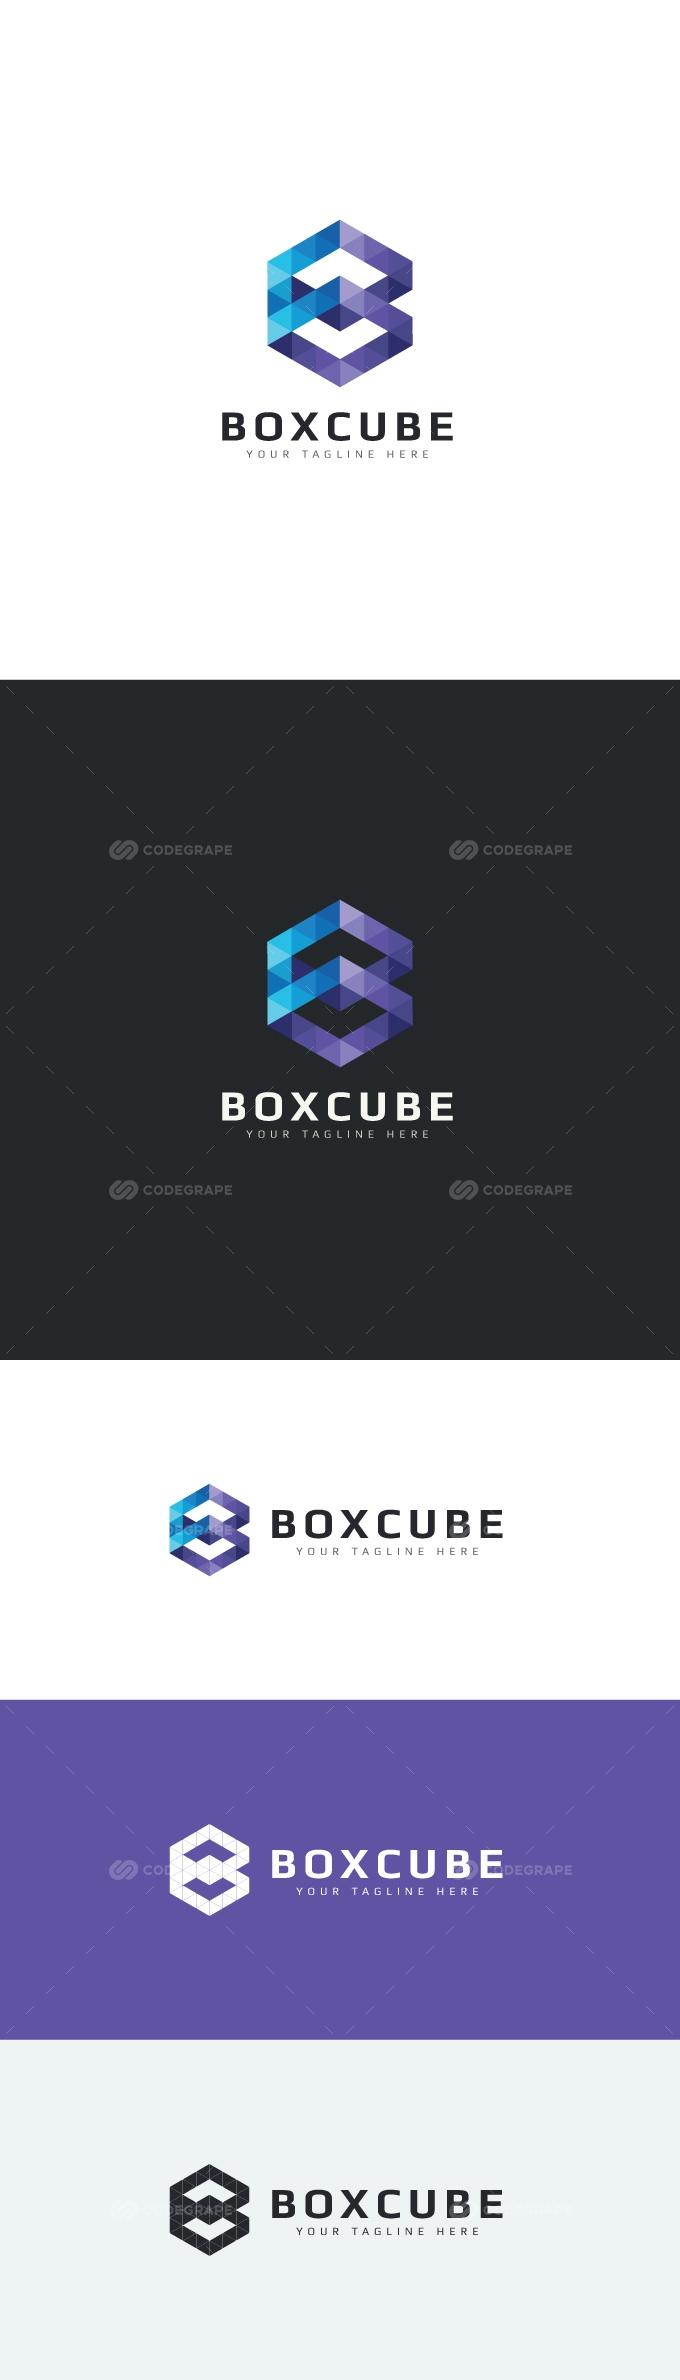 Box Cube Logo